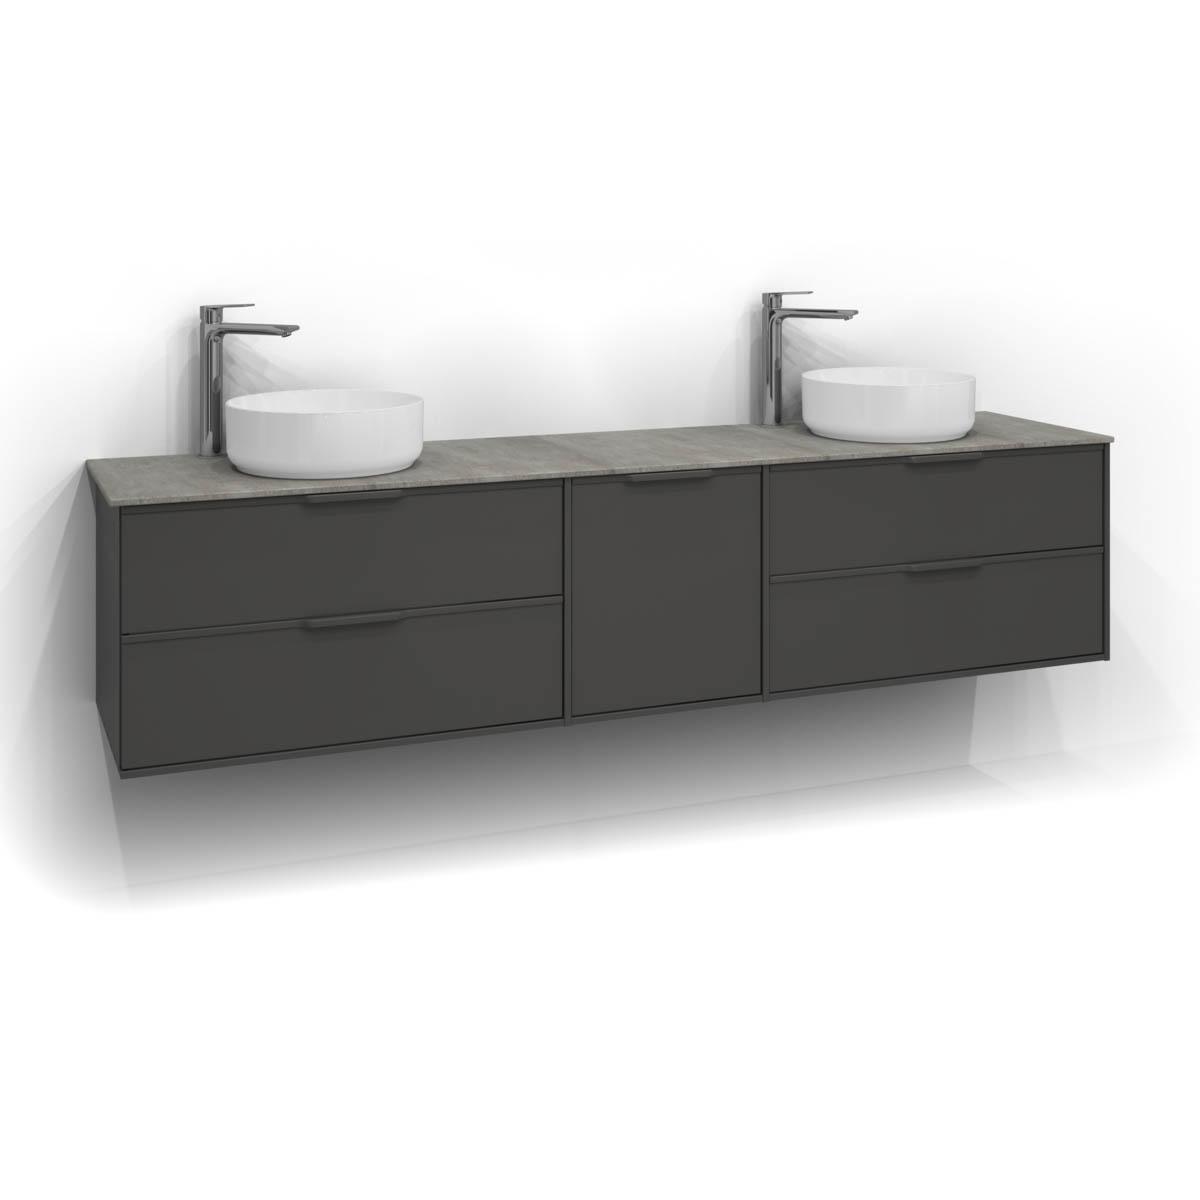 Tvättställsskåp Svedbergs Epos 200x45